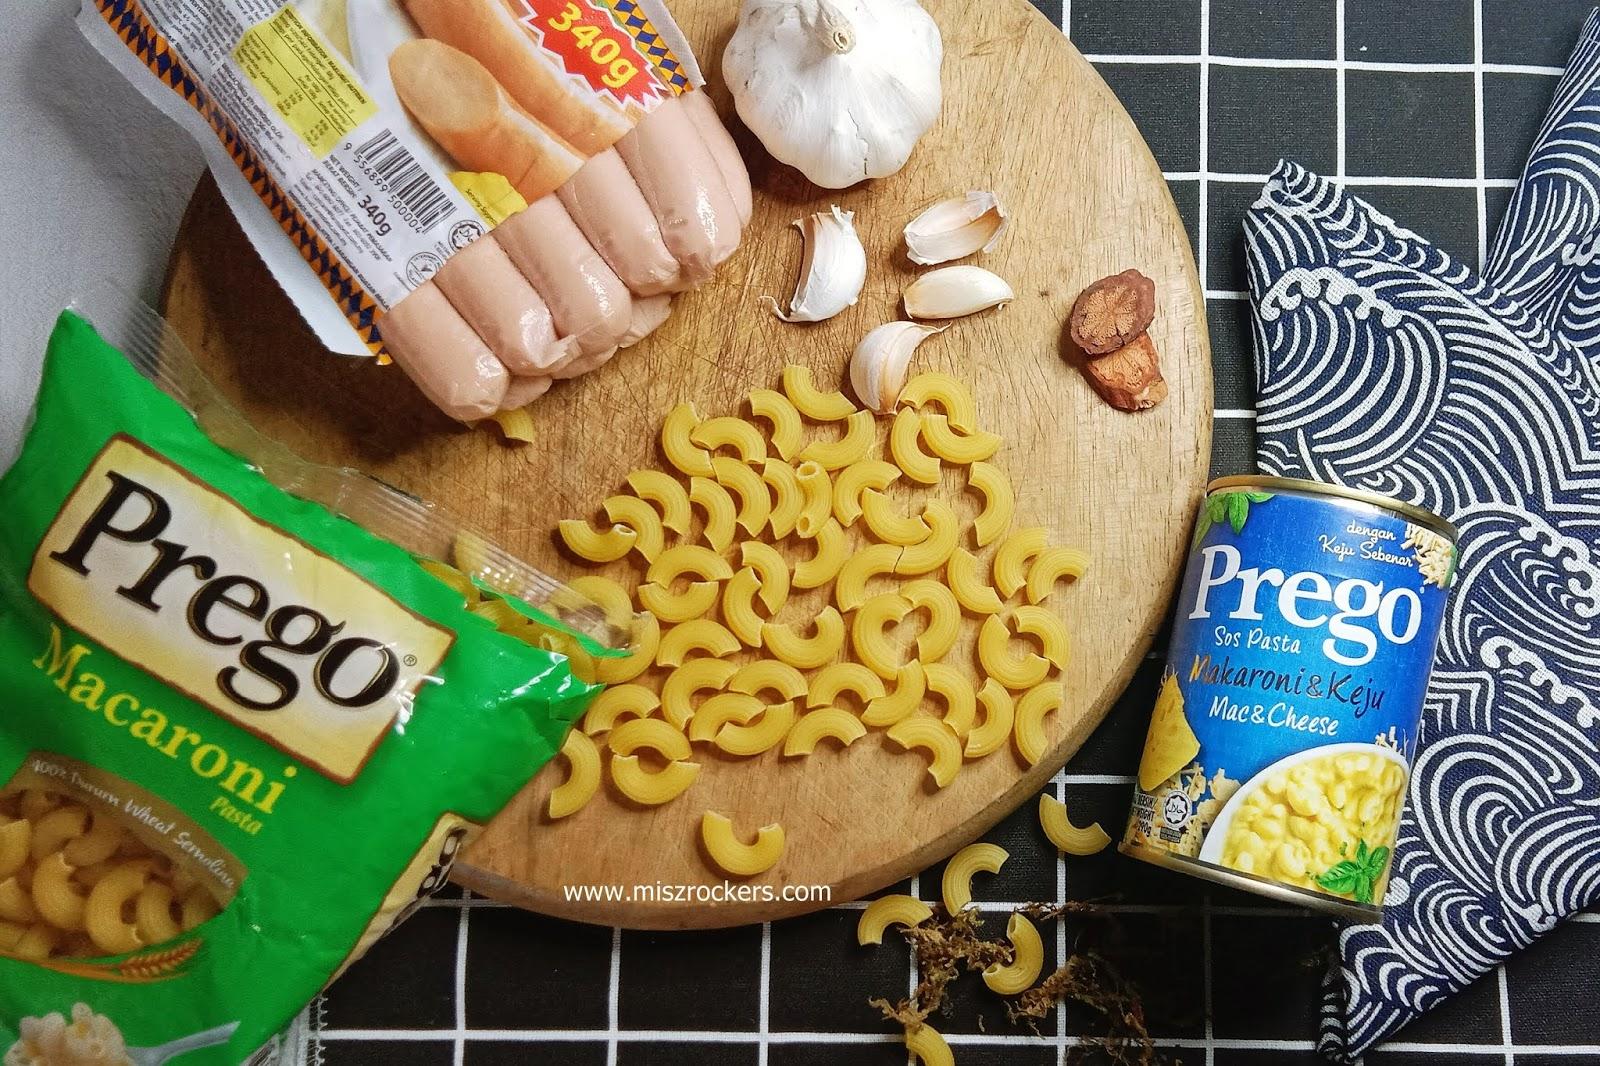 Prego Sos Pasta Makaroni Dan Keju Yang Pekat Dan Sedap